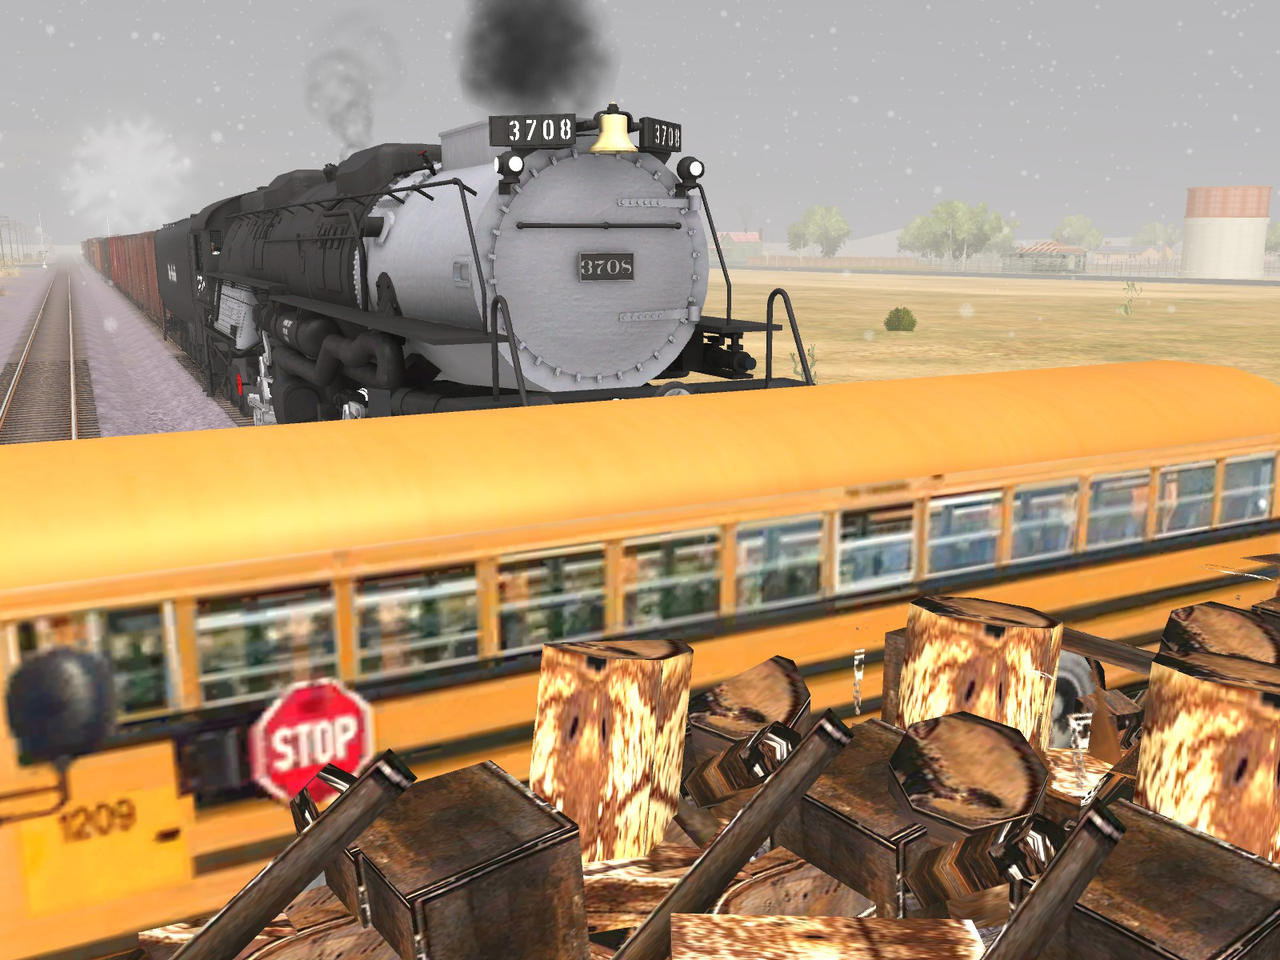 Trainz Wrecks 52 Sandy Utah Train Bus Crash By Oregonrailfan On Deviantart